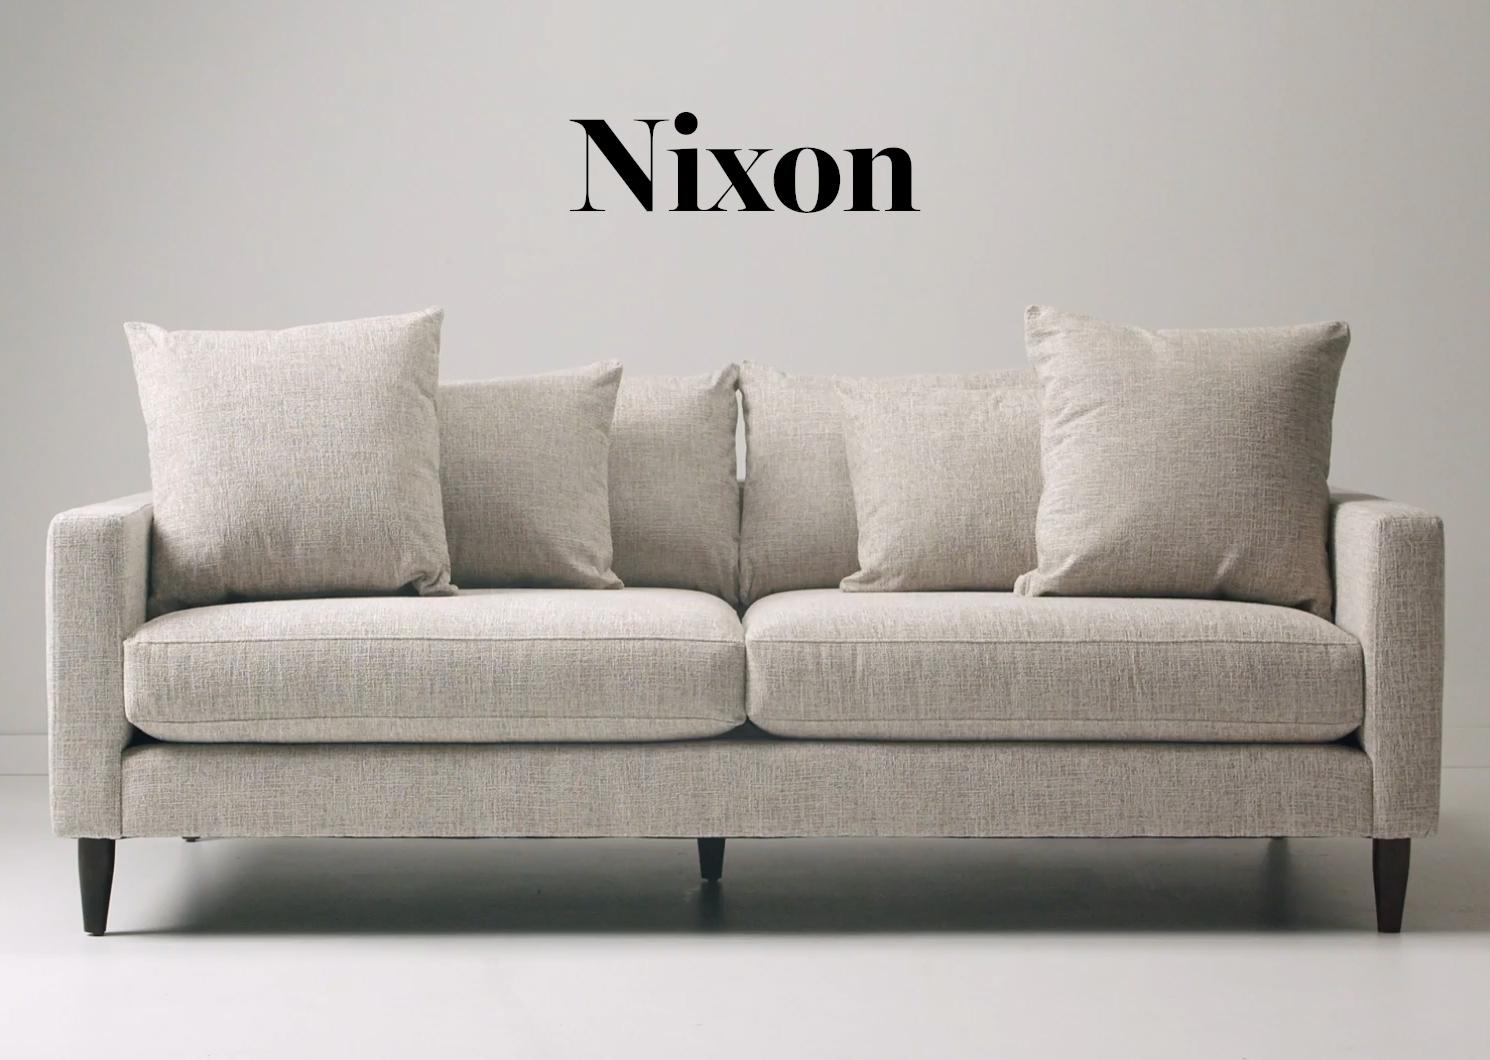 Nixon Custom Sofa Chaise